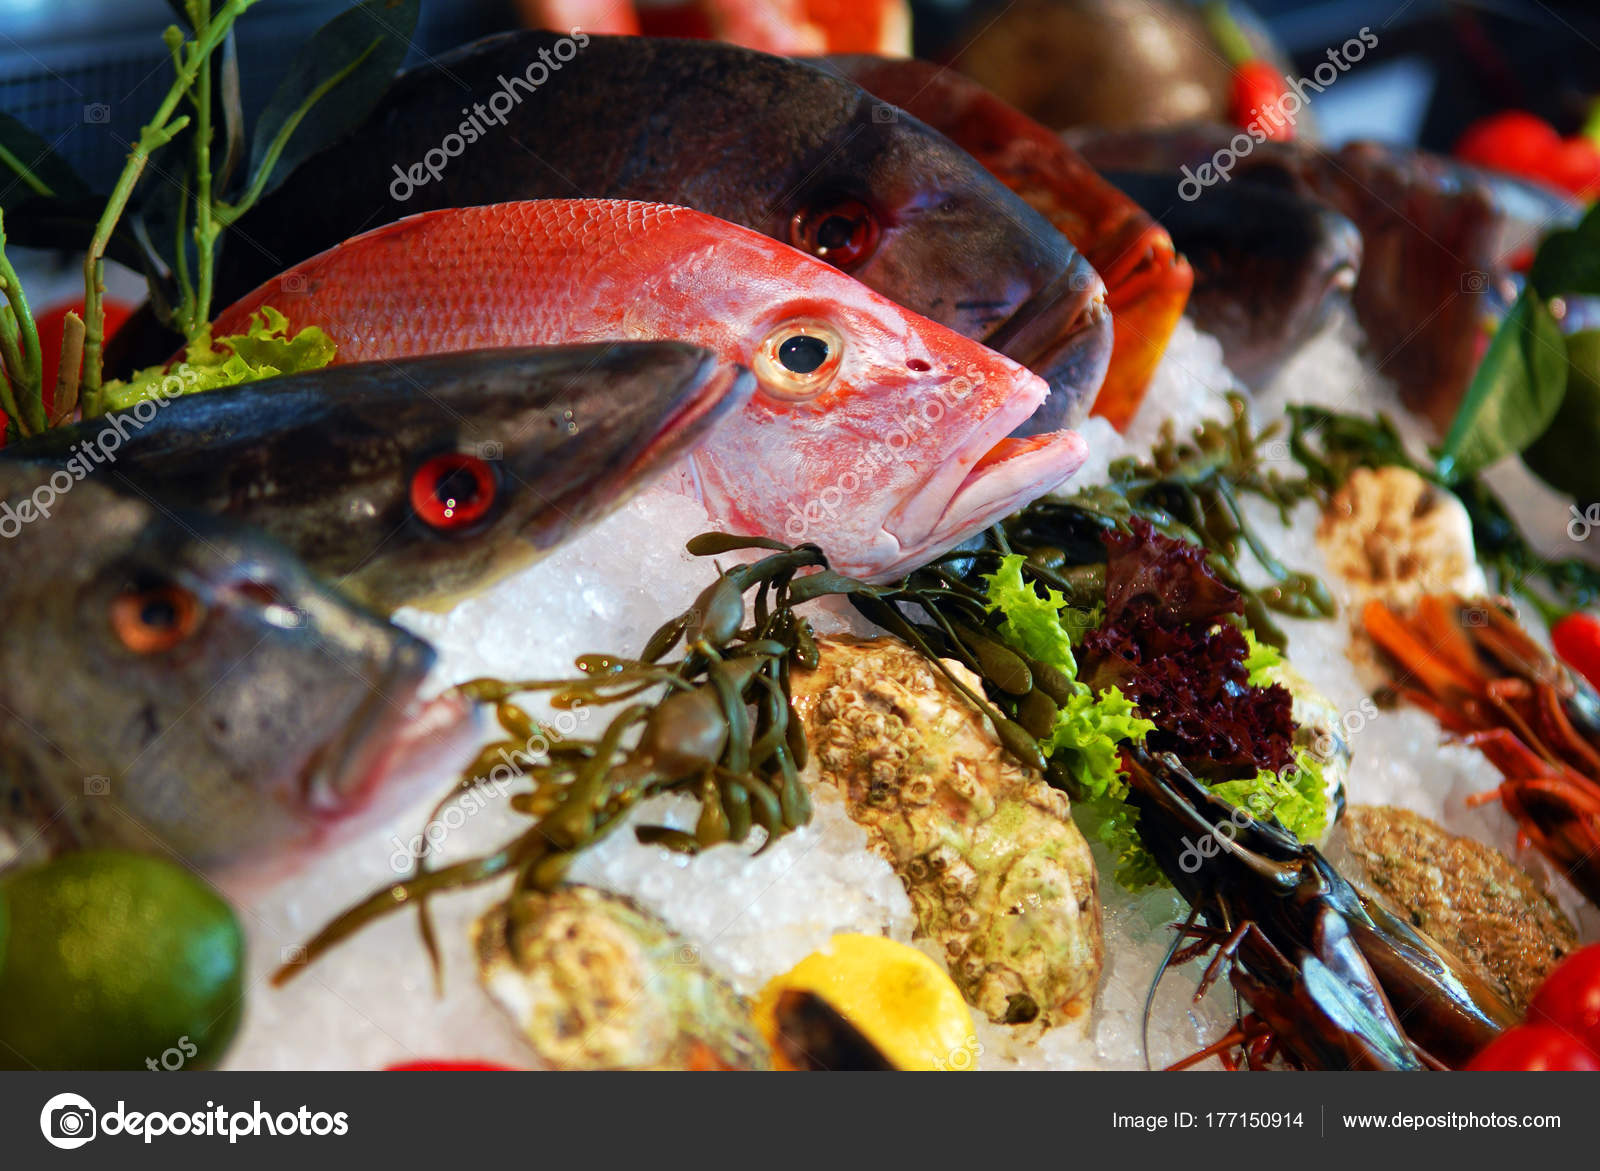 8aad3e6fb3c9d6 Вітрина магазину риби — Стокове фото — продукти харчування © sergioz ...